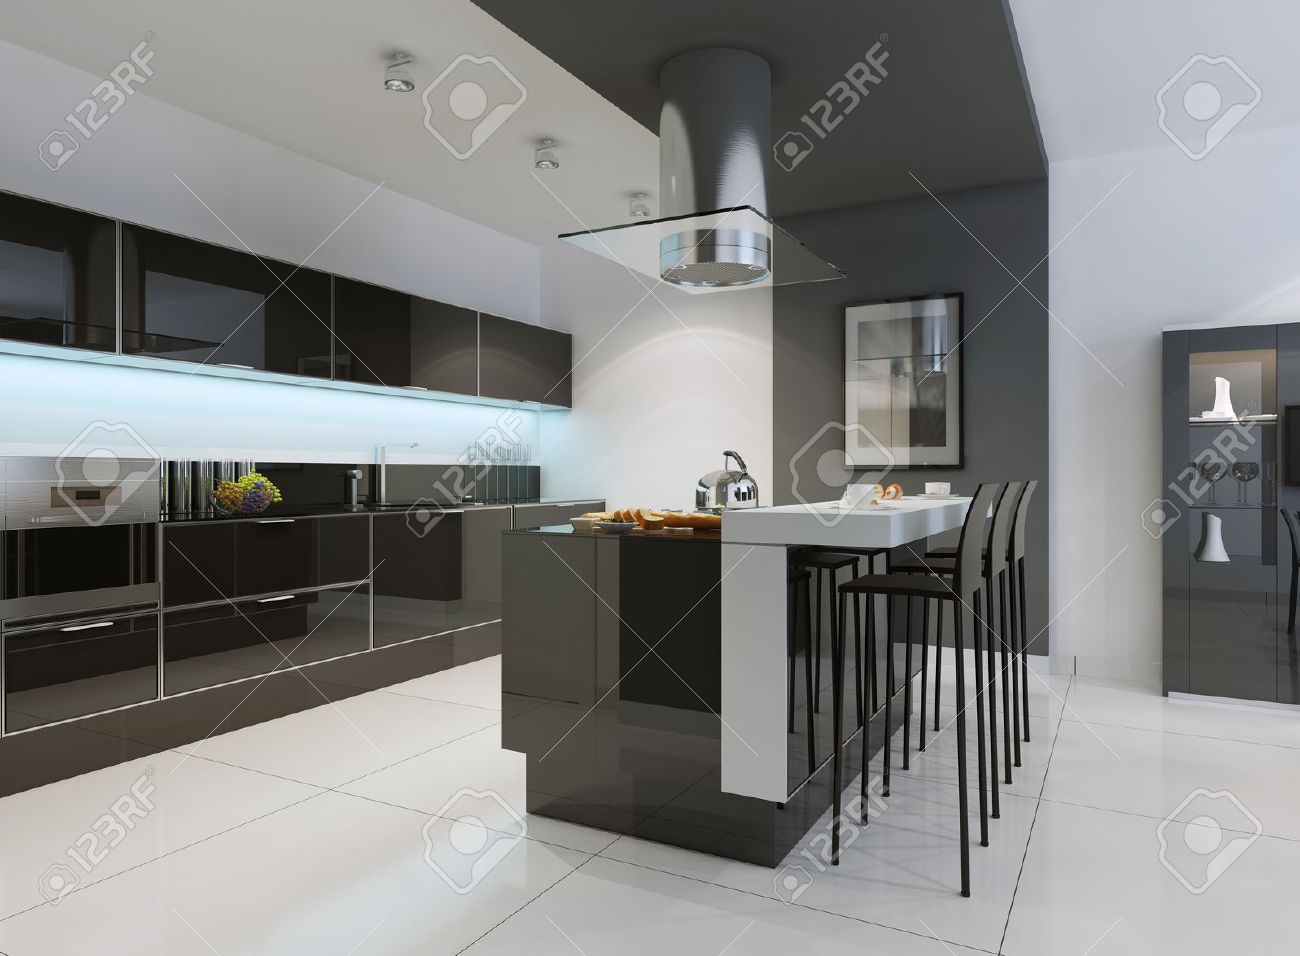 Mattonelle Cucina Moderne. Produzione Cucine In Muratura Bovolone ...